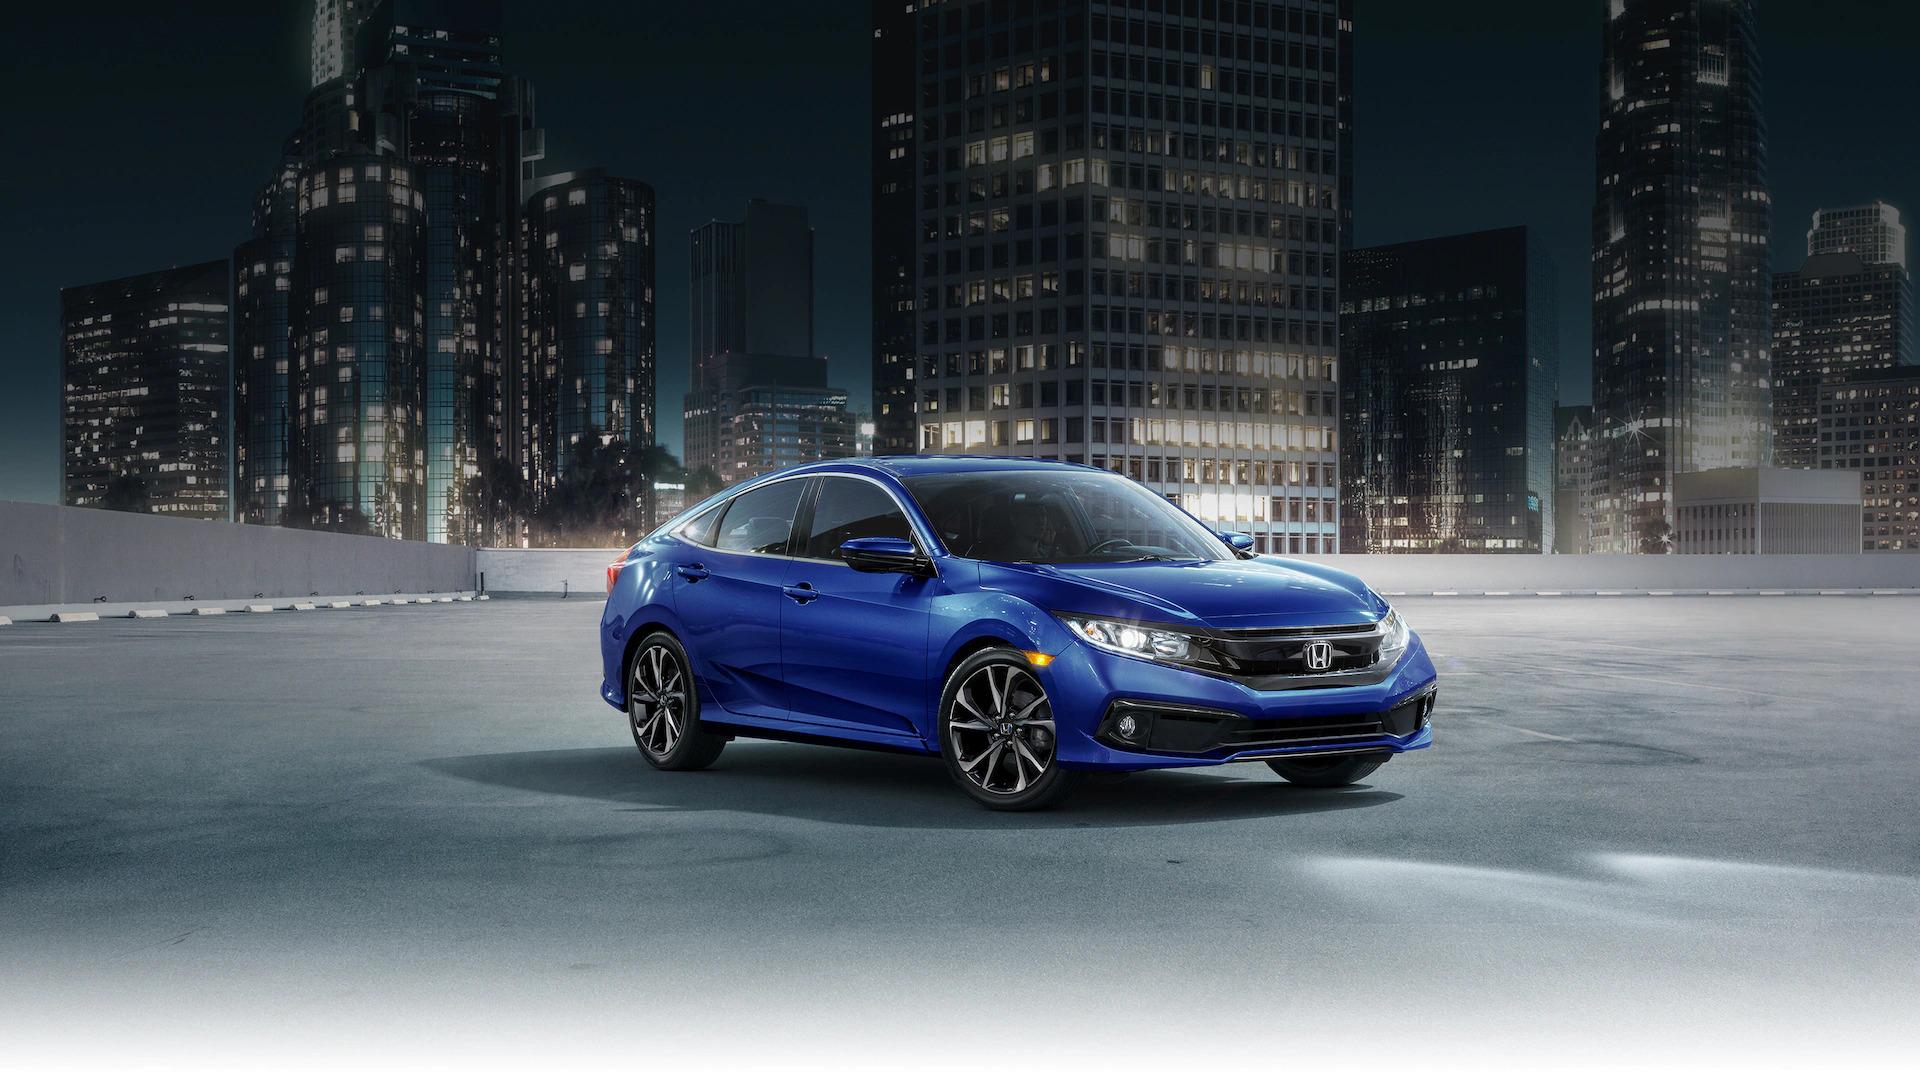 New 2021 Honda Civic Trims and Configurations